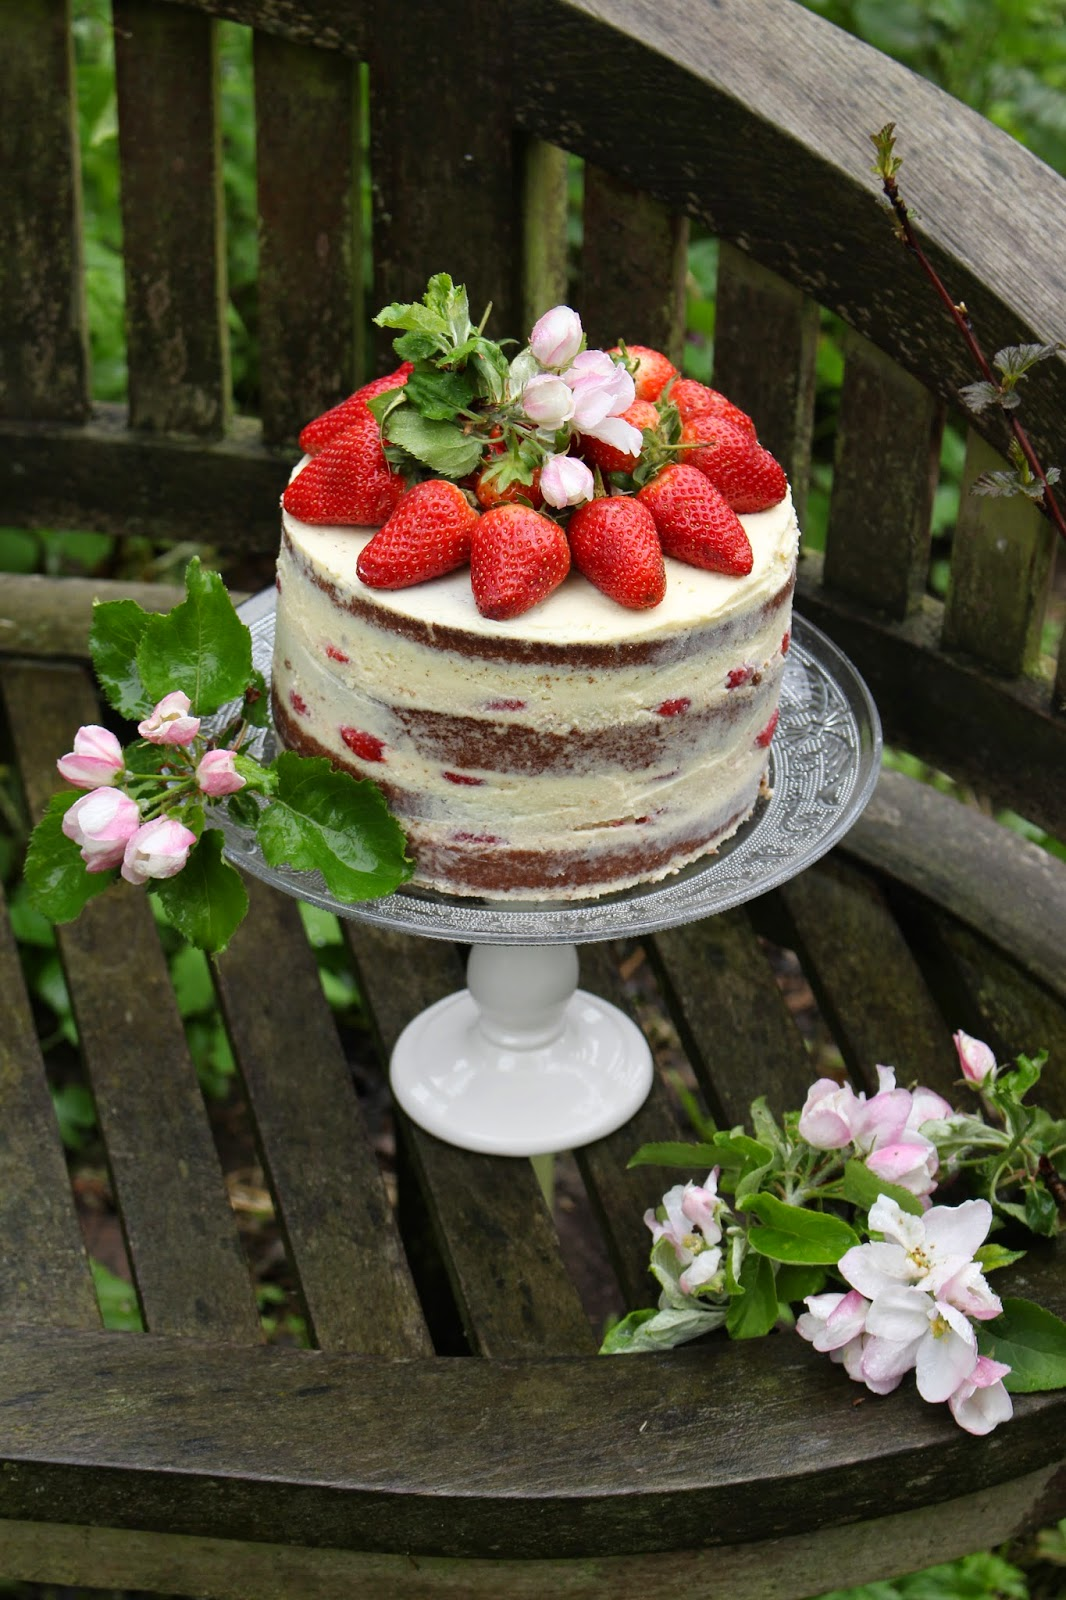 torten lust rezept naked cake erdbeer wei e schokolade buttermilch torte. Black Bedroom Furniture Sets. Home Design Ideas